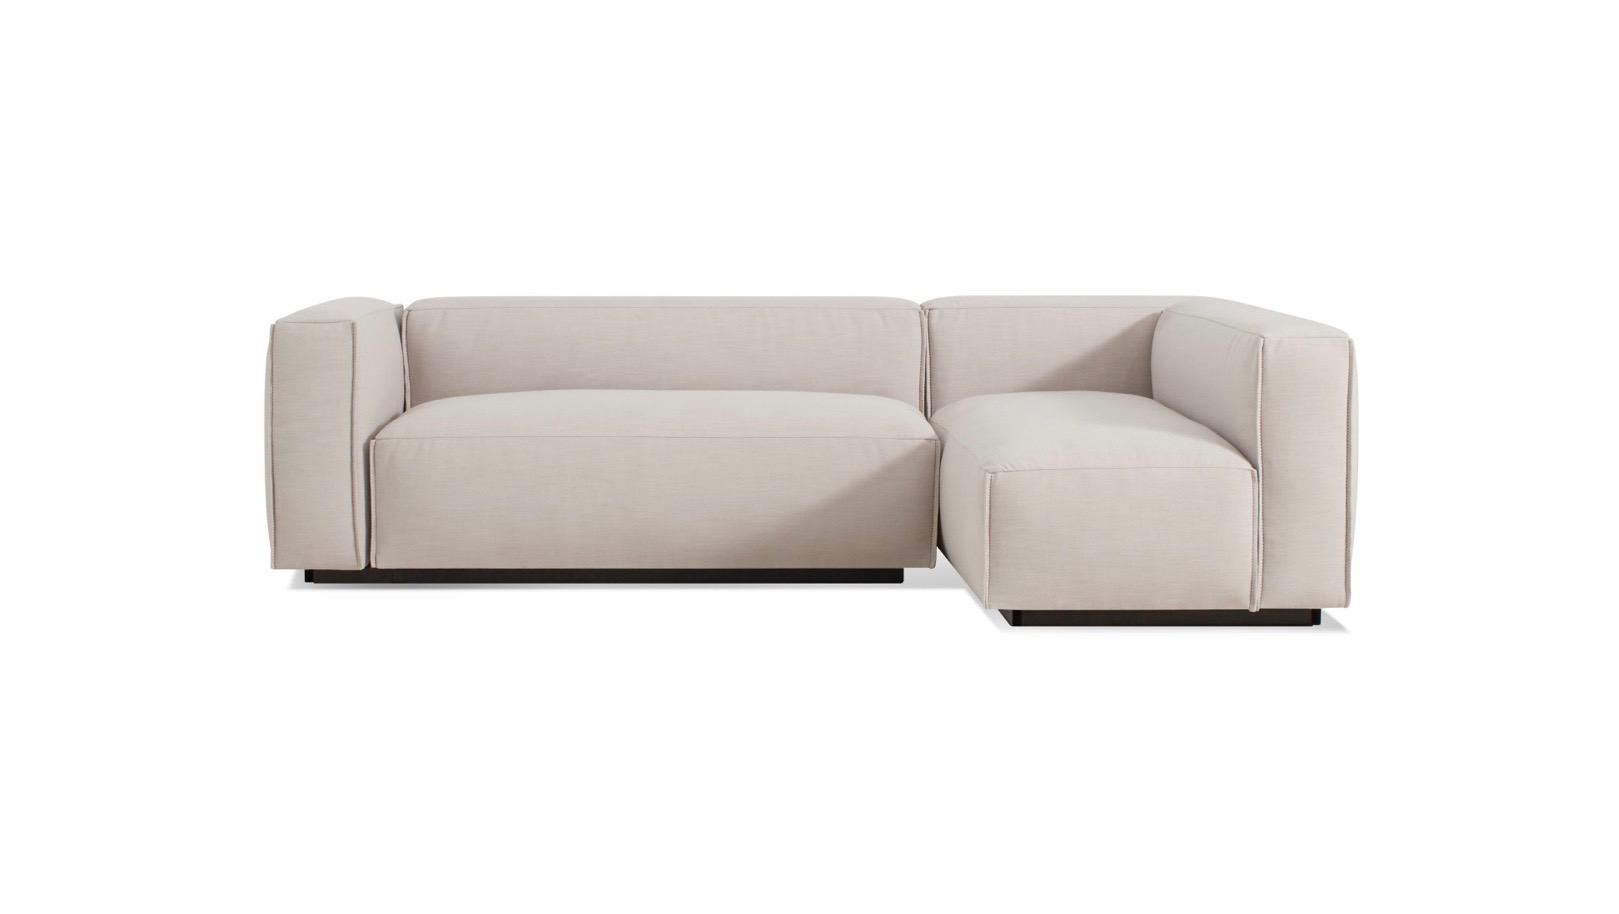 cleon small sectional sofa by blu dot hub modern home giftpost hub modern home gift